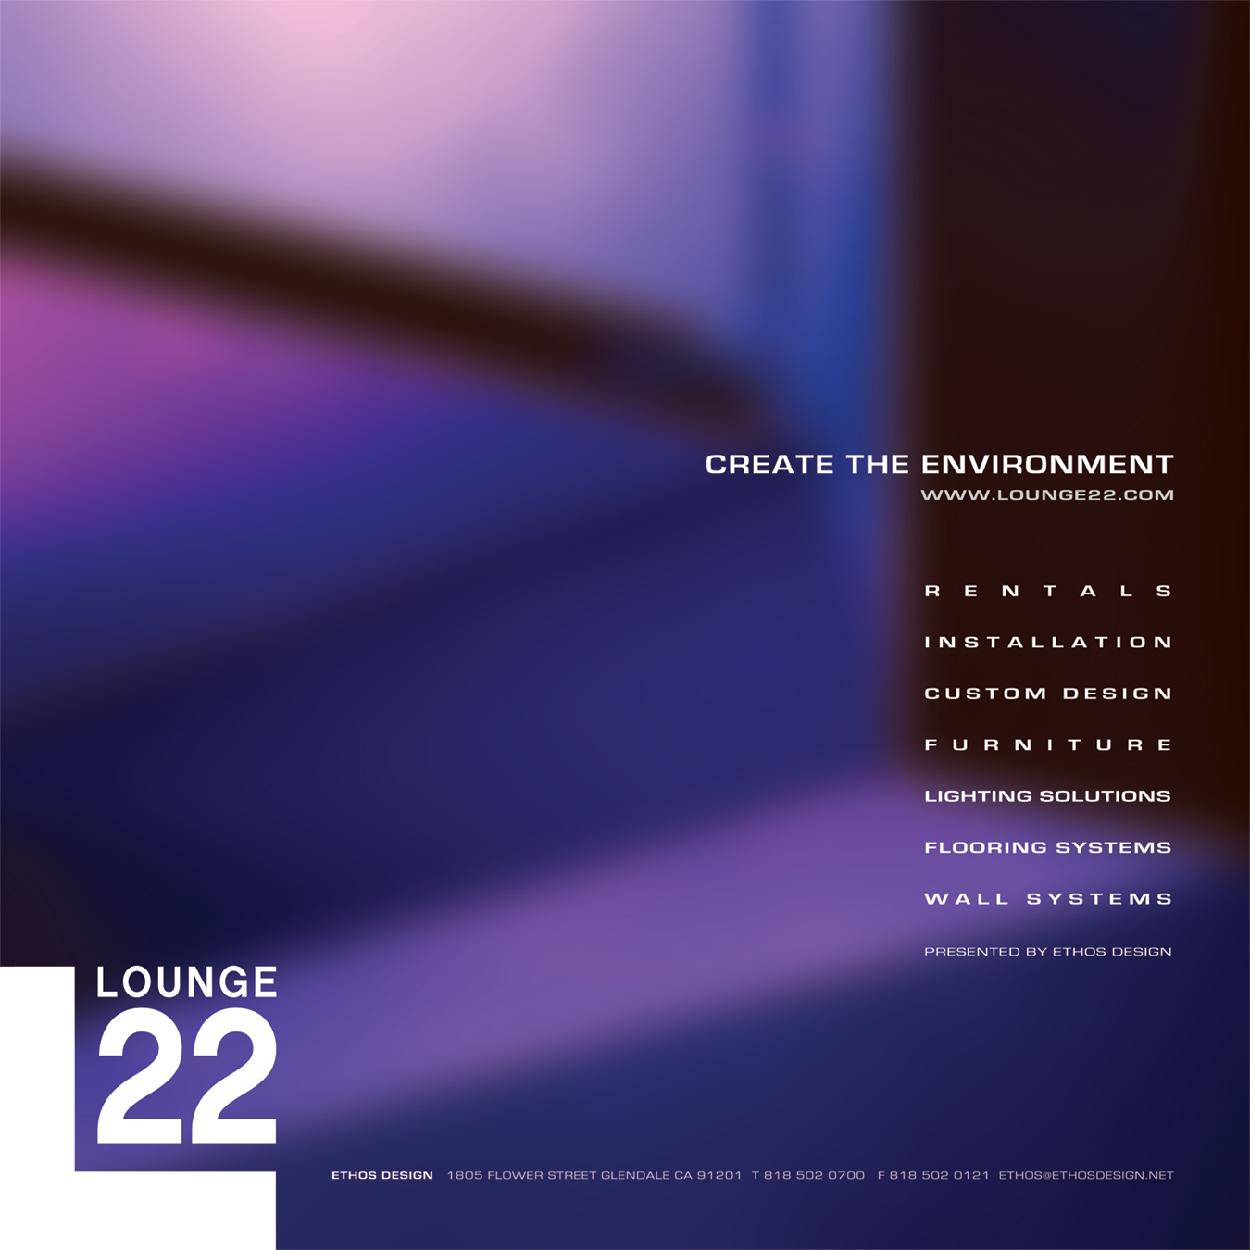 Brand_L22_14.jpg